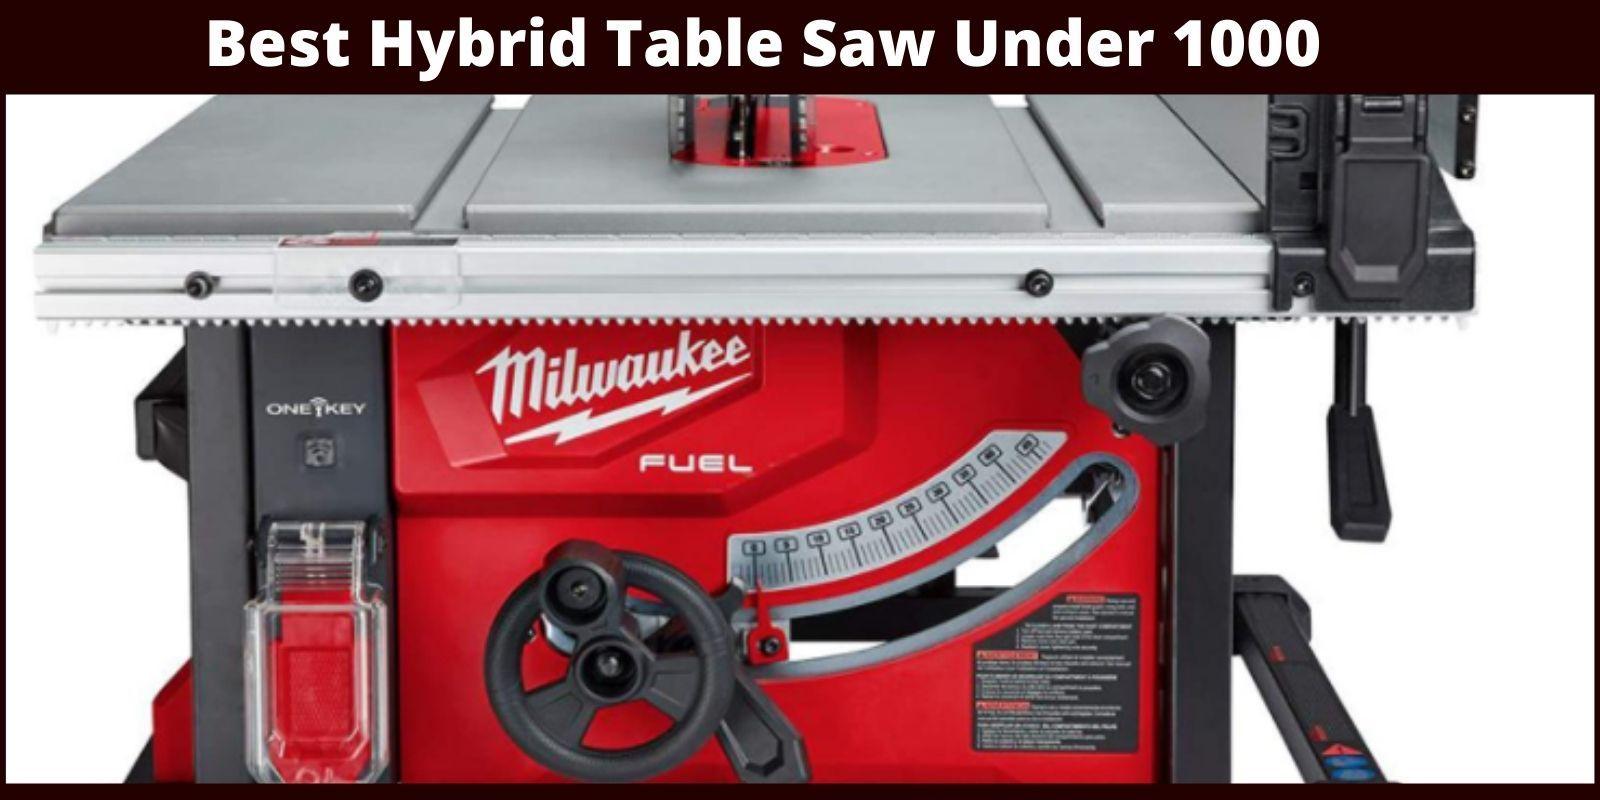 Best Hybrid Table Saw Under 1000